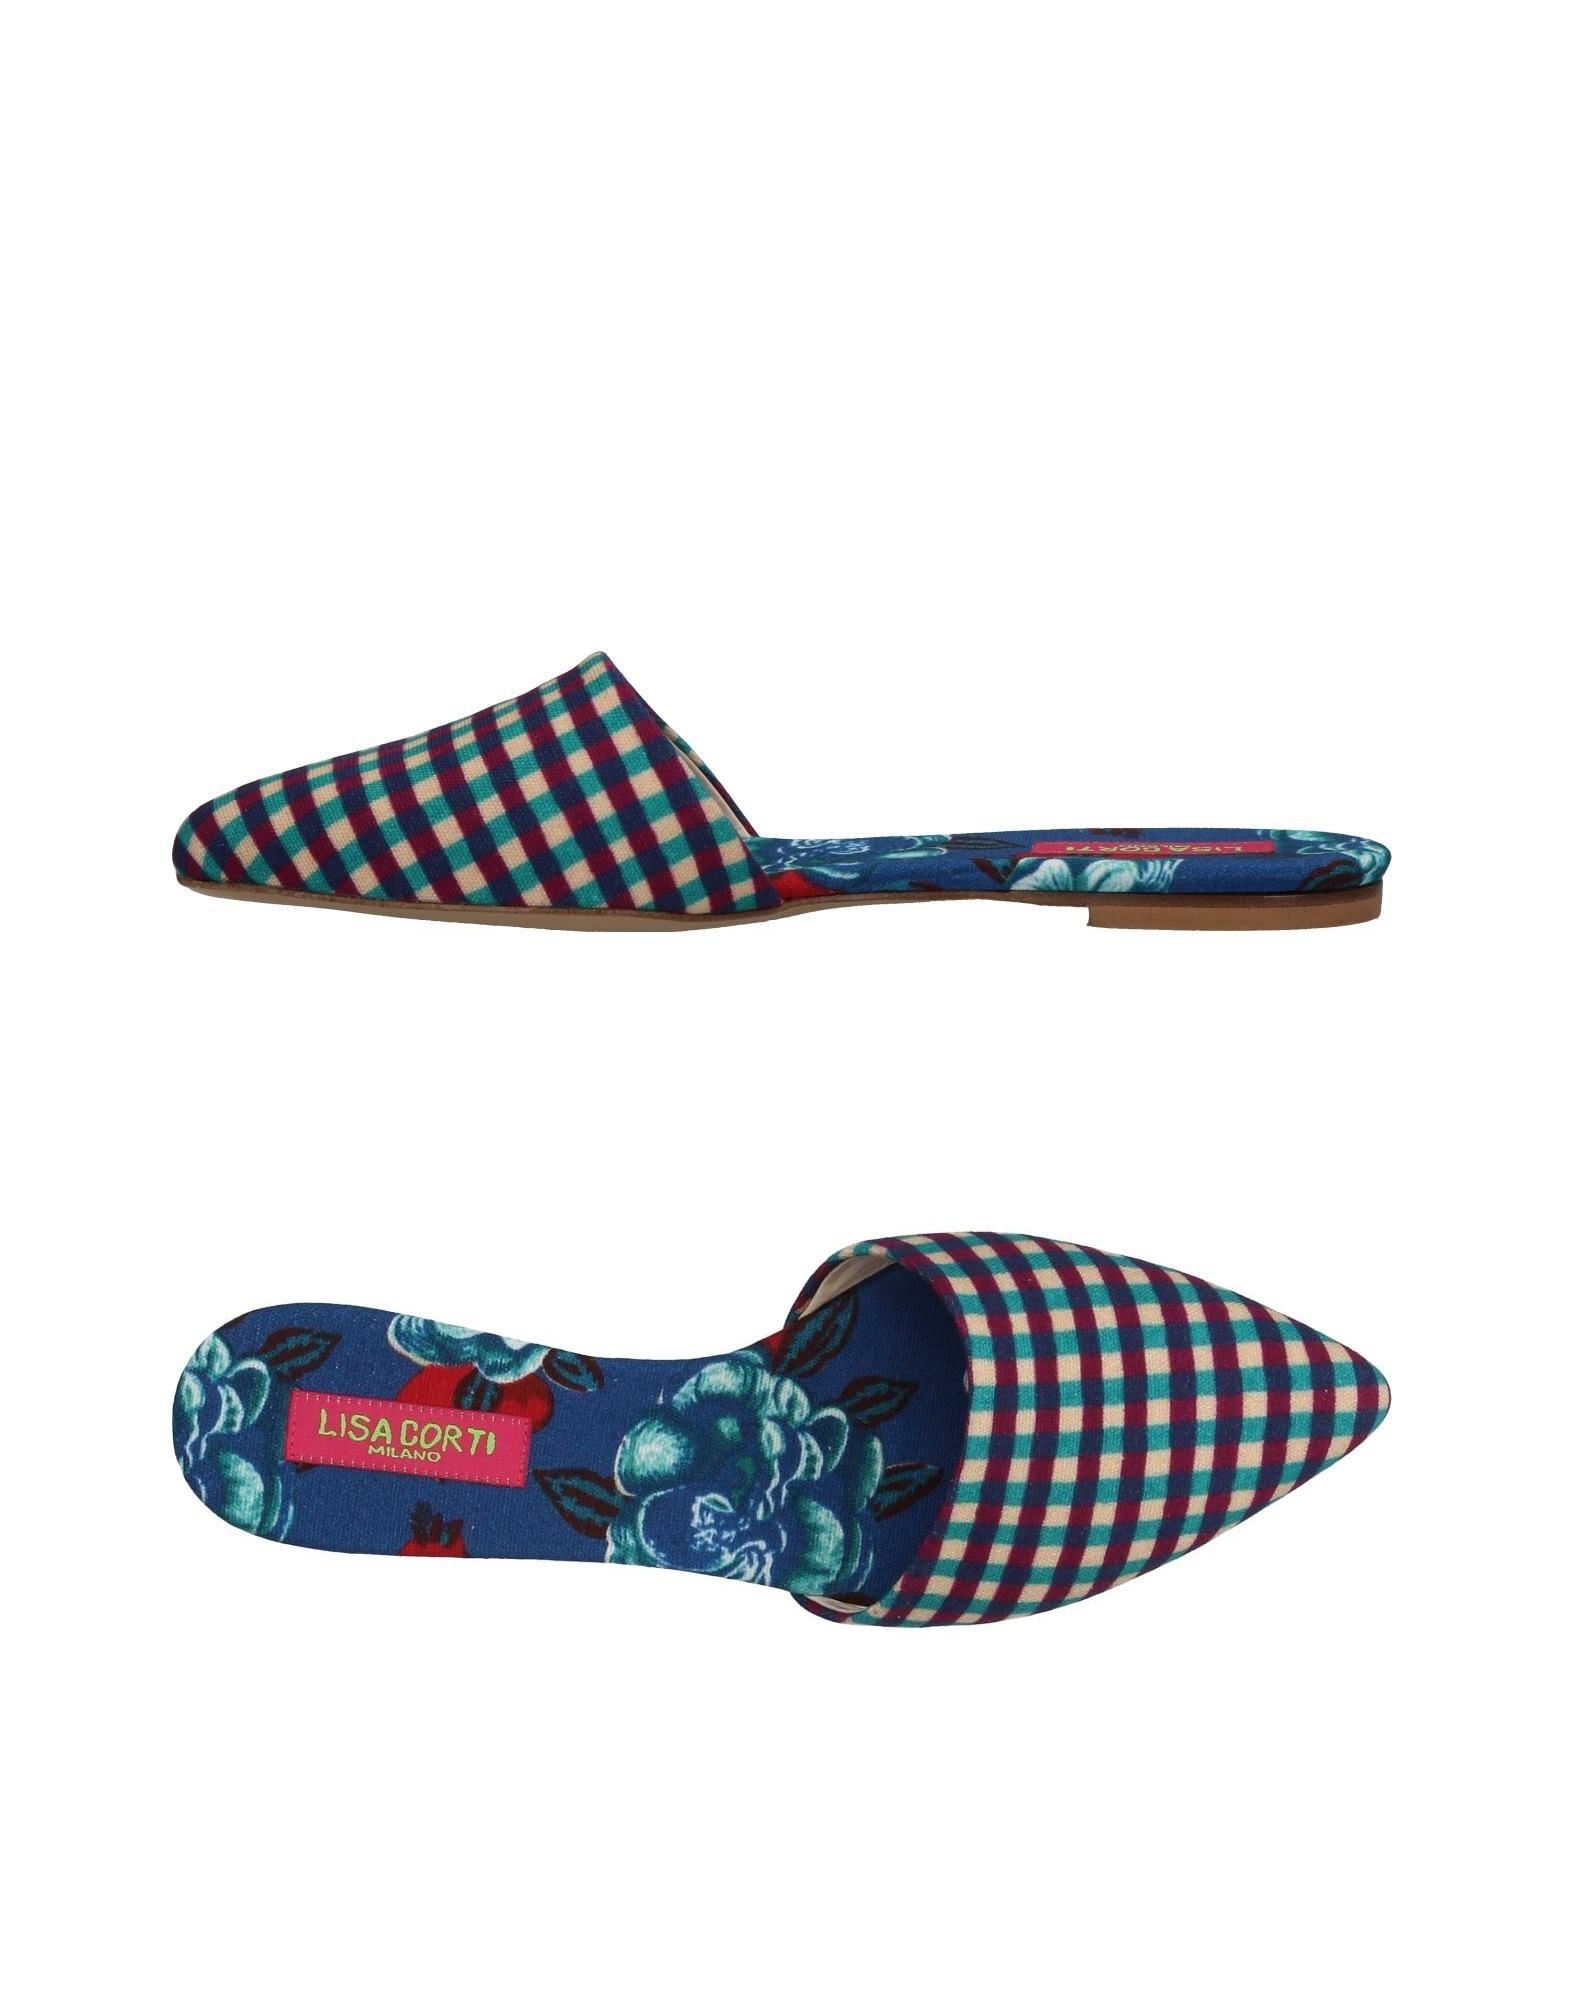 Stilvolle billige Pantoletten Schuhe Lisa Corti Pantoletten billige Damen  11381752RX 868f00